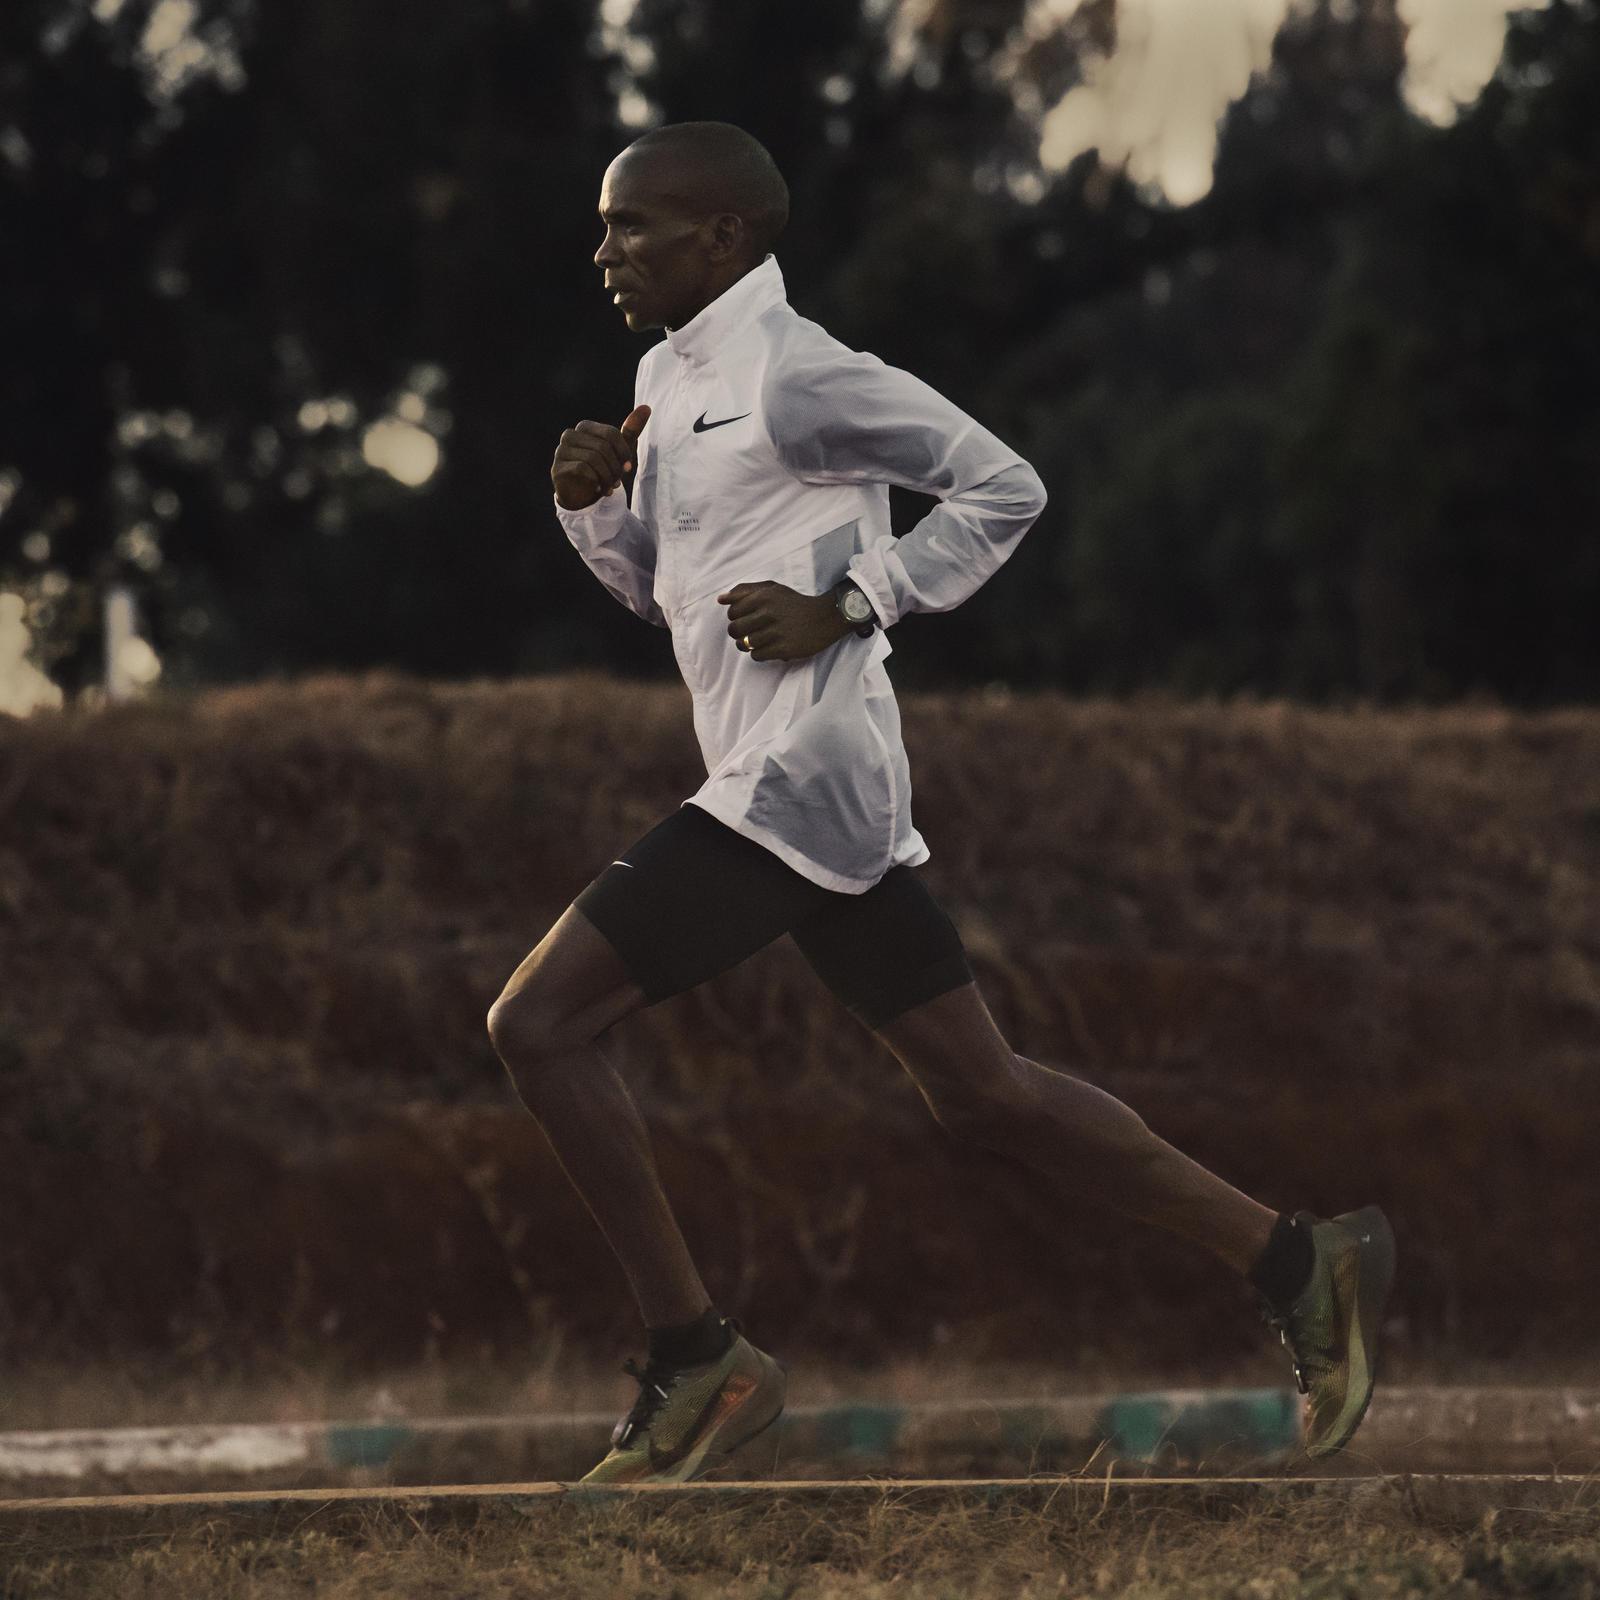 Nike, Eliud Kipchoge